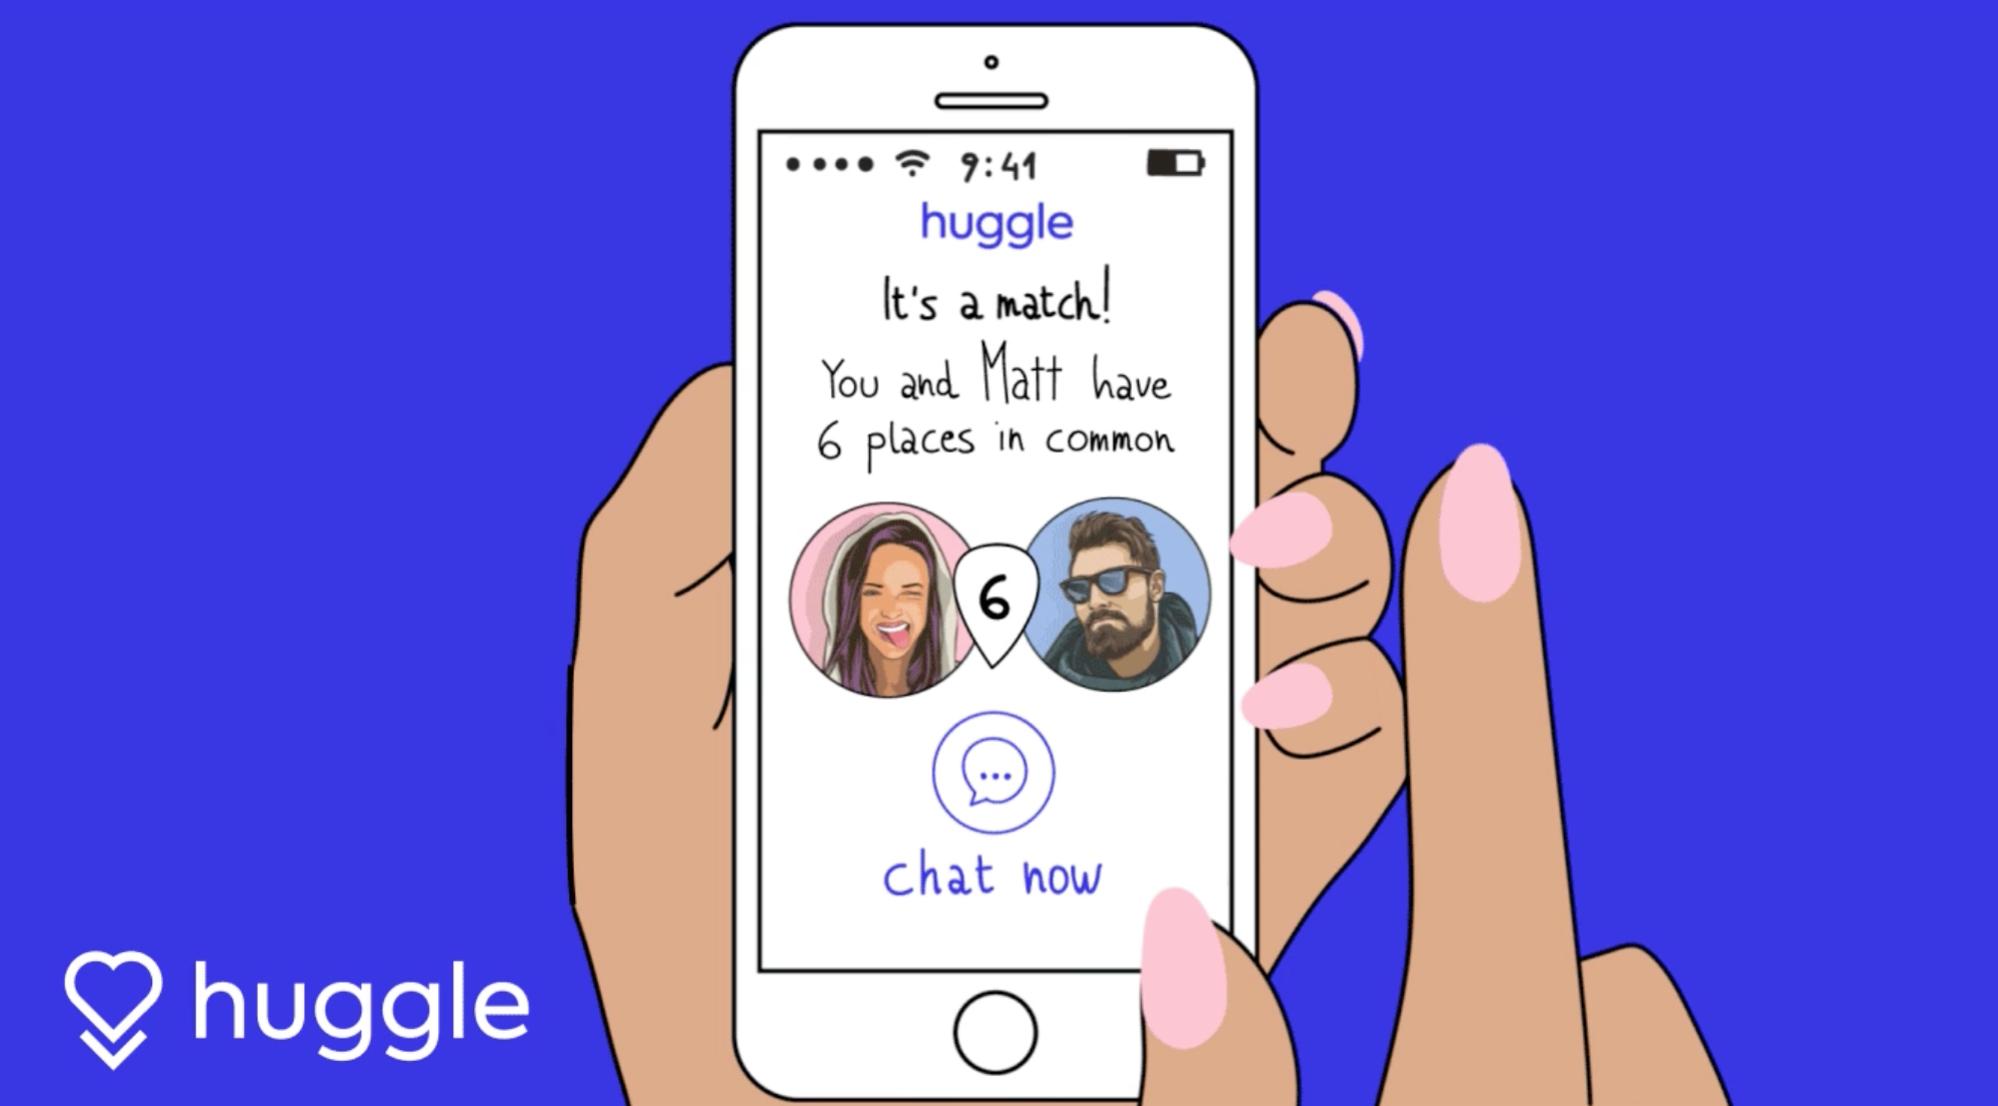 Face match dating app